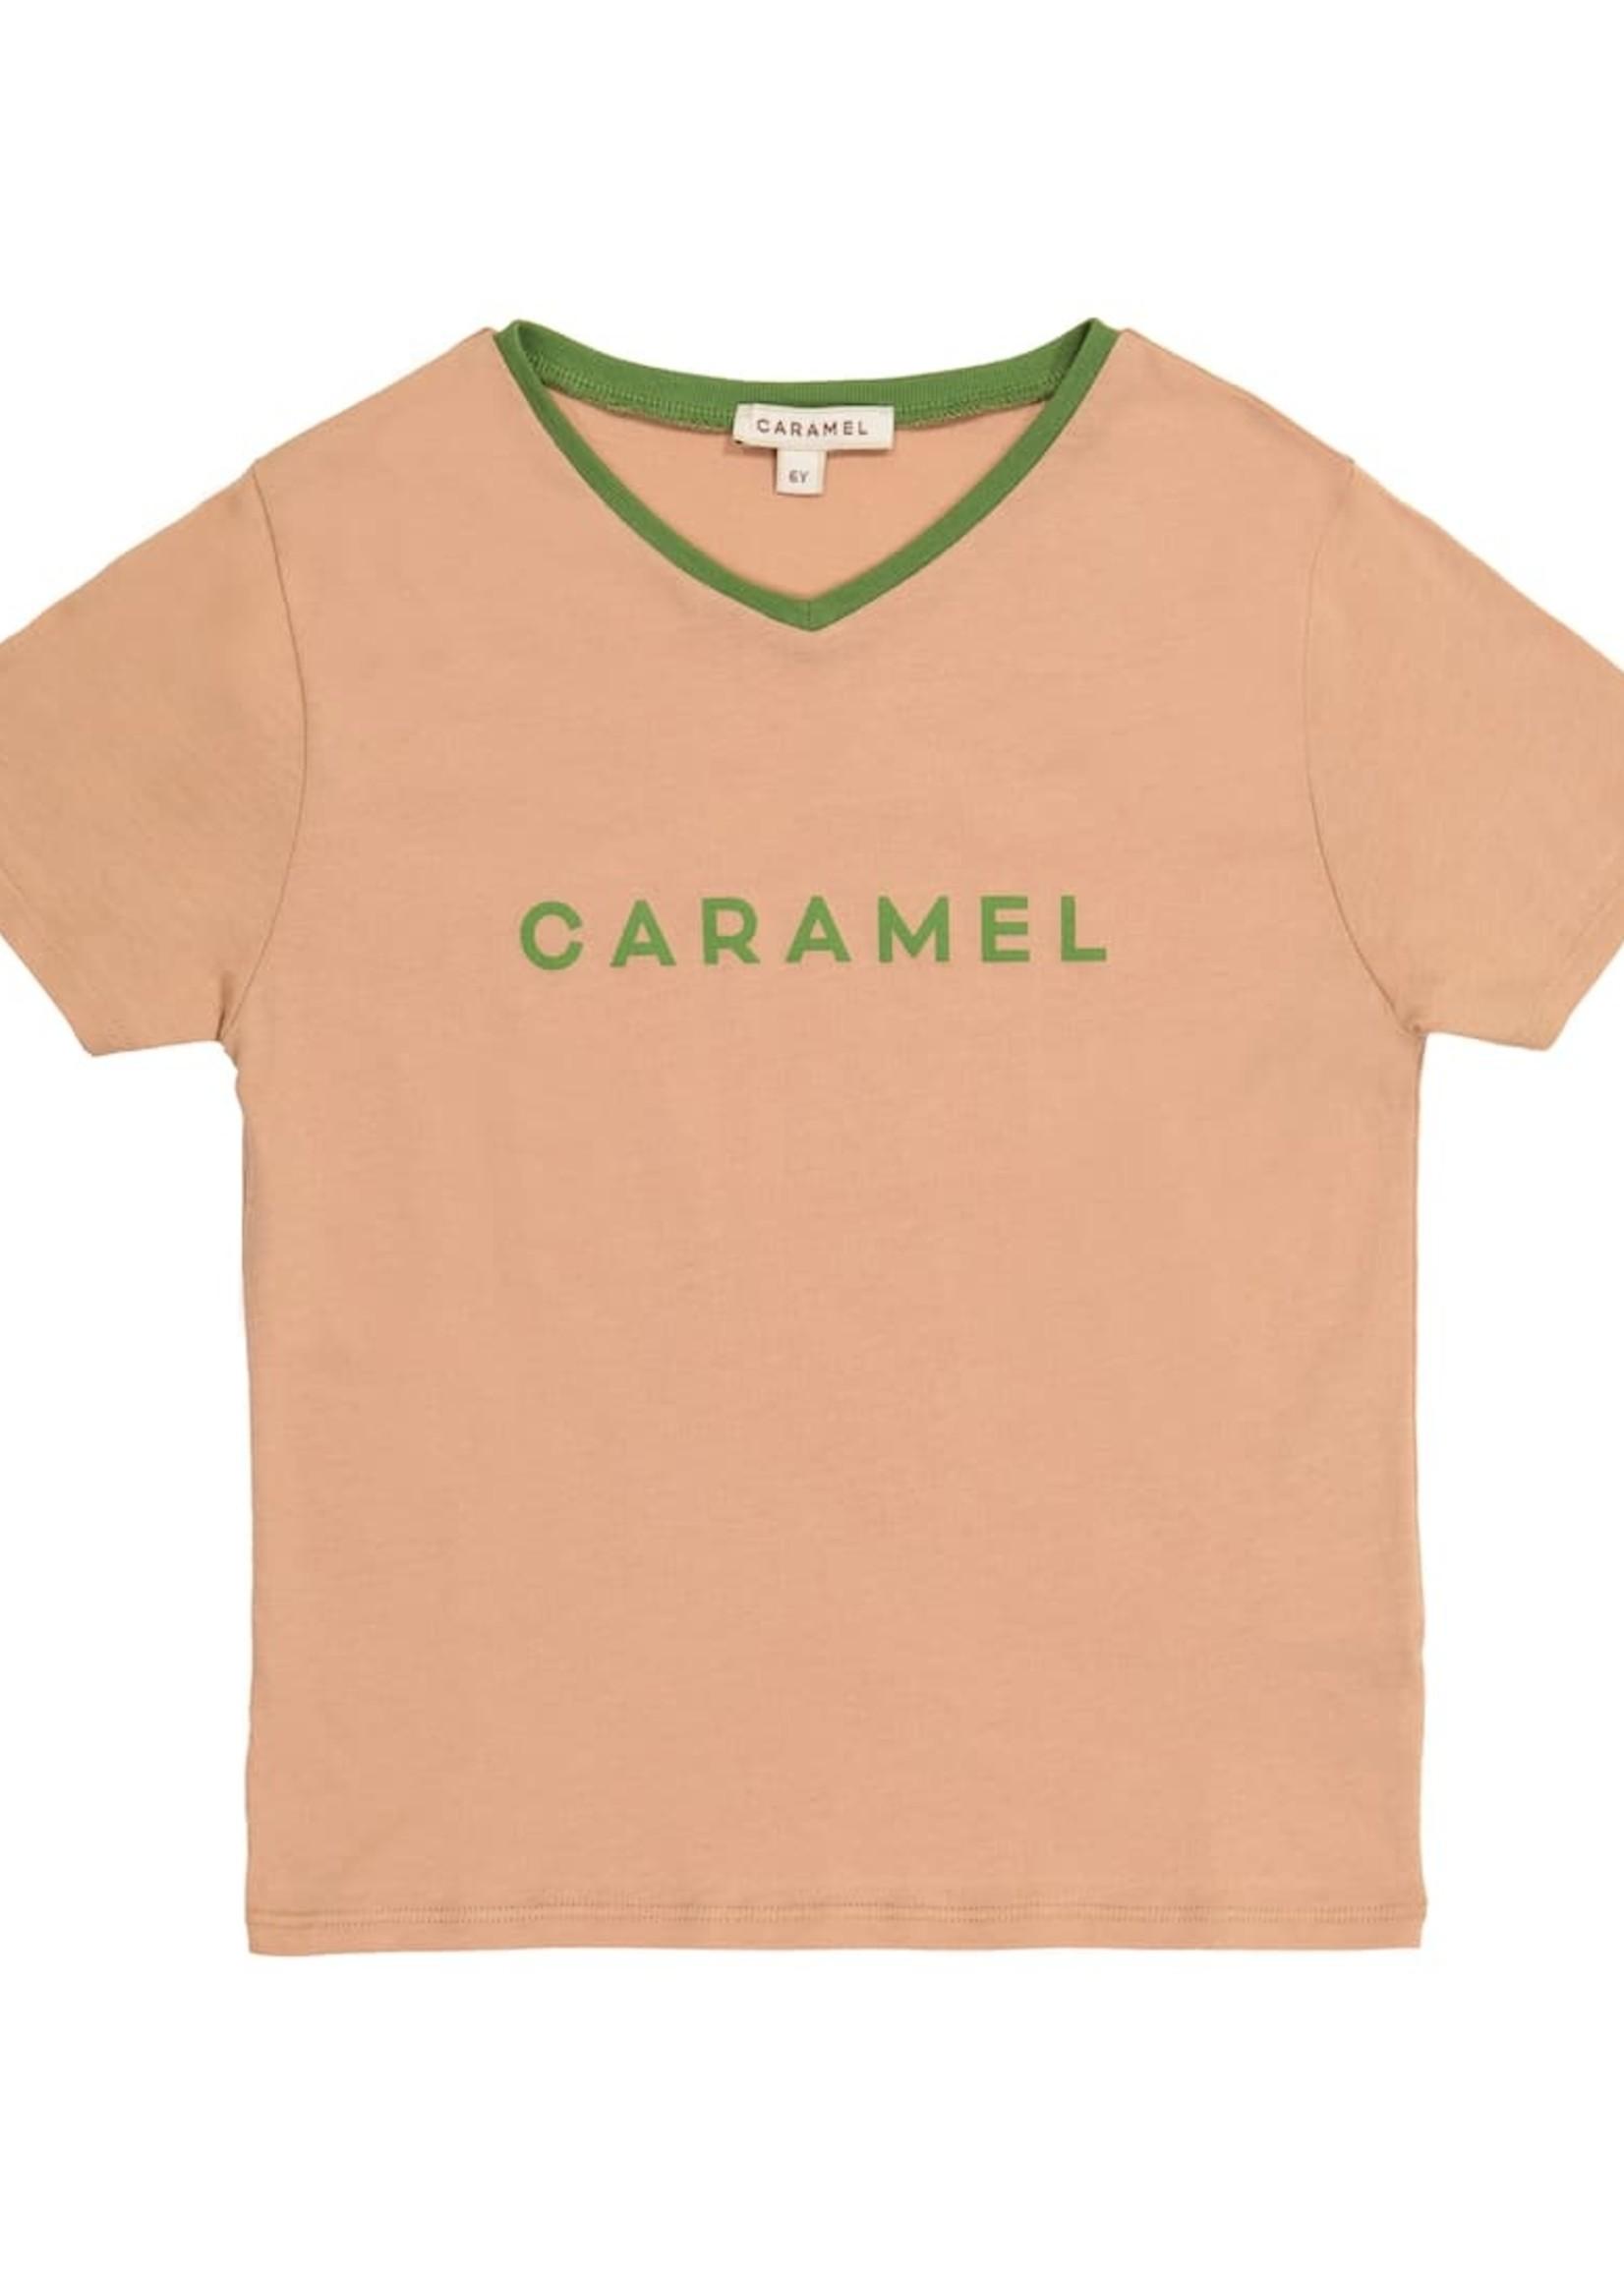 Caramel Caramel-ss21 SHARK T-SHIRT